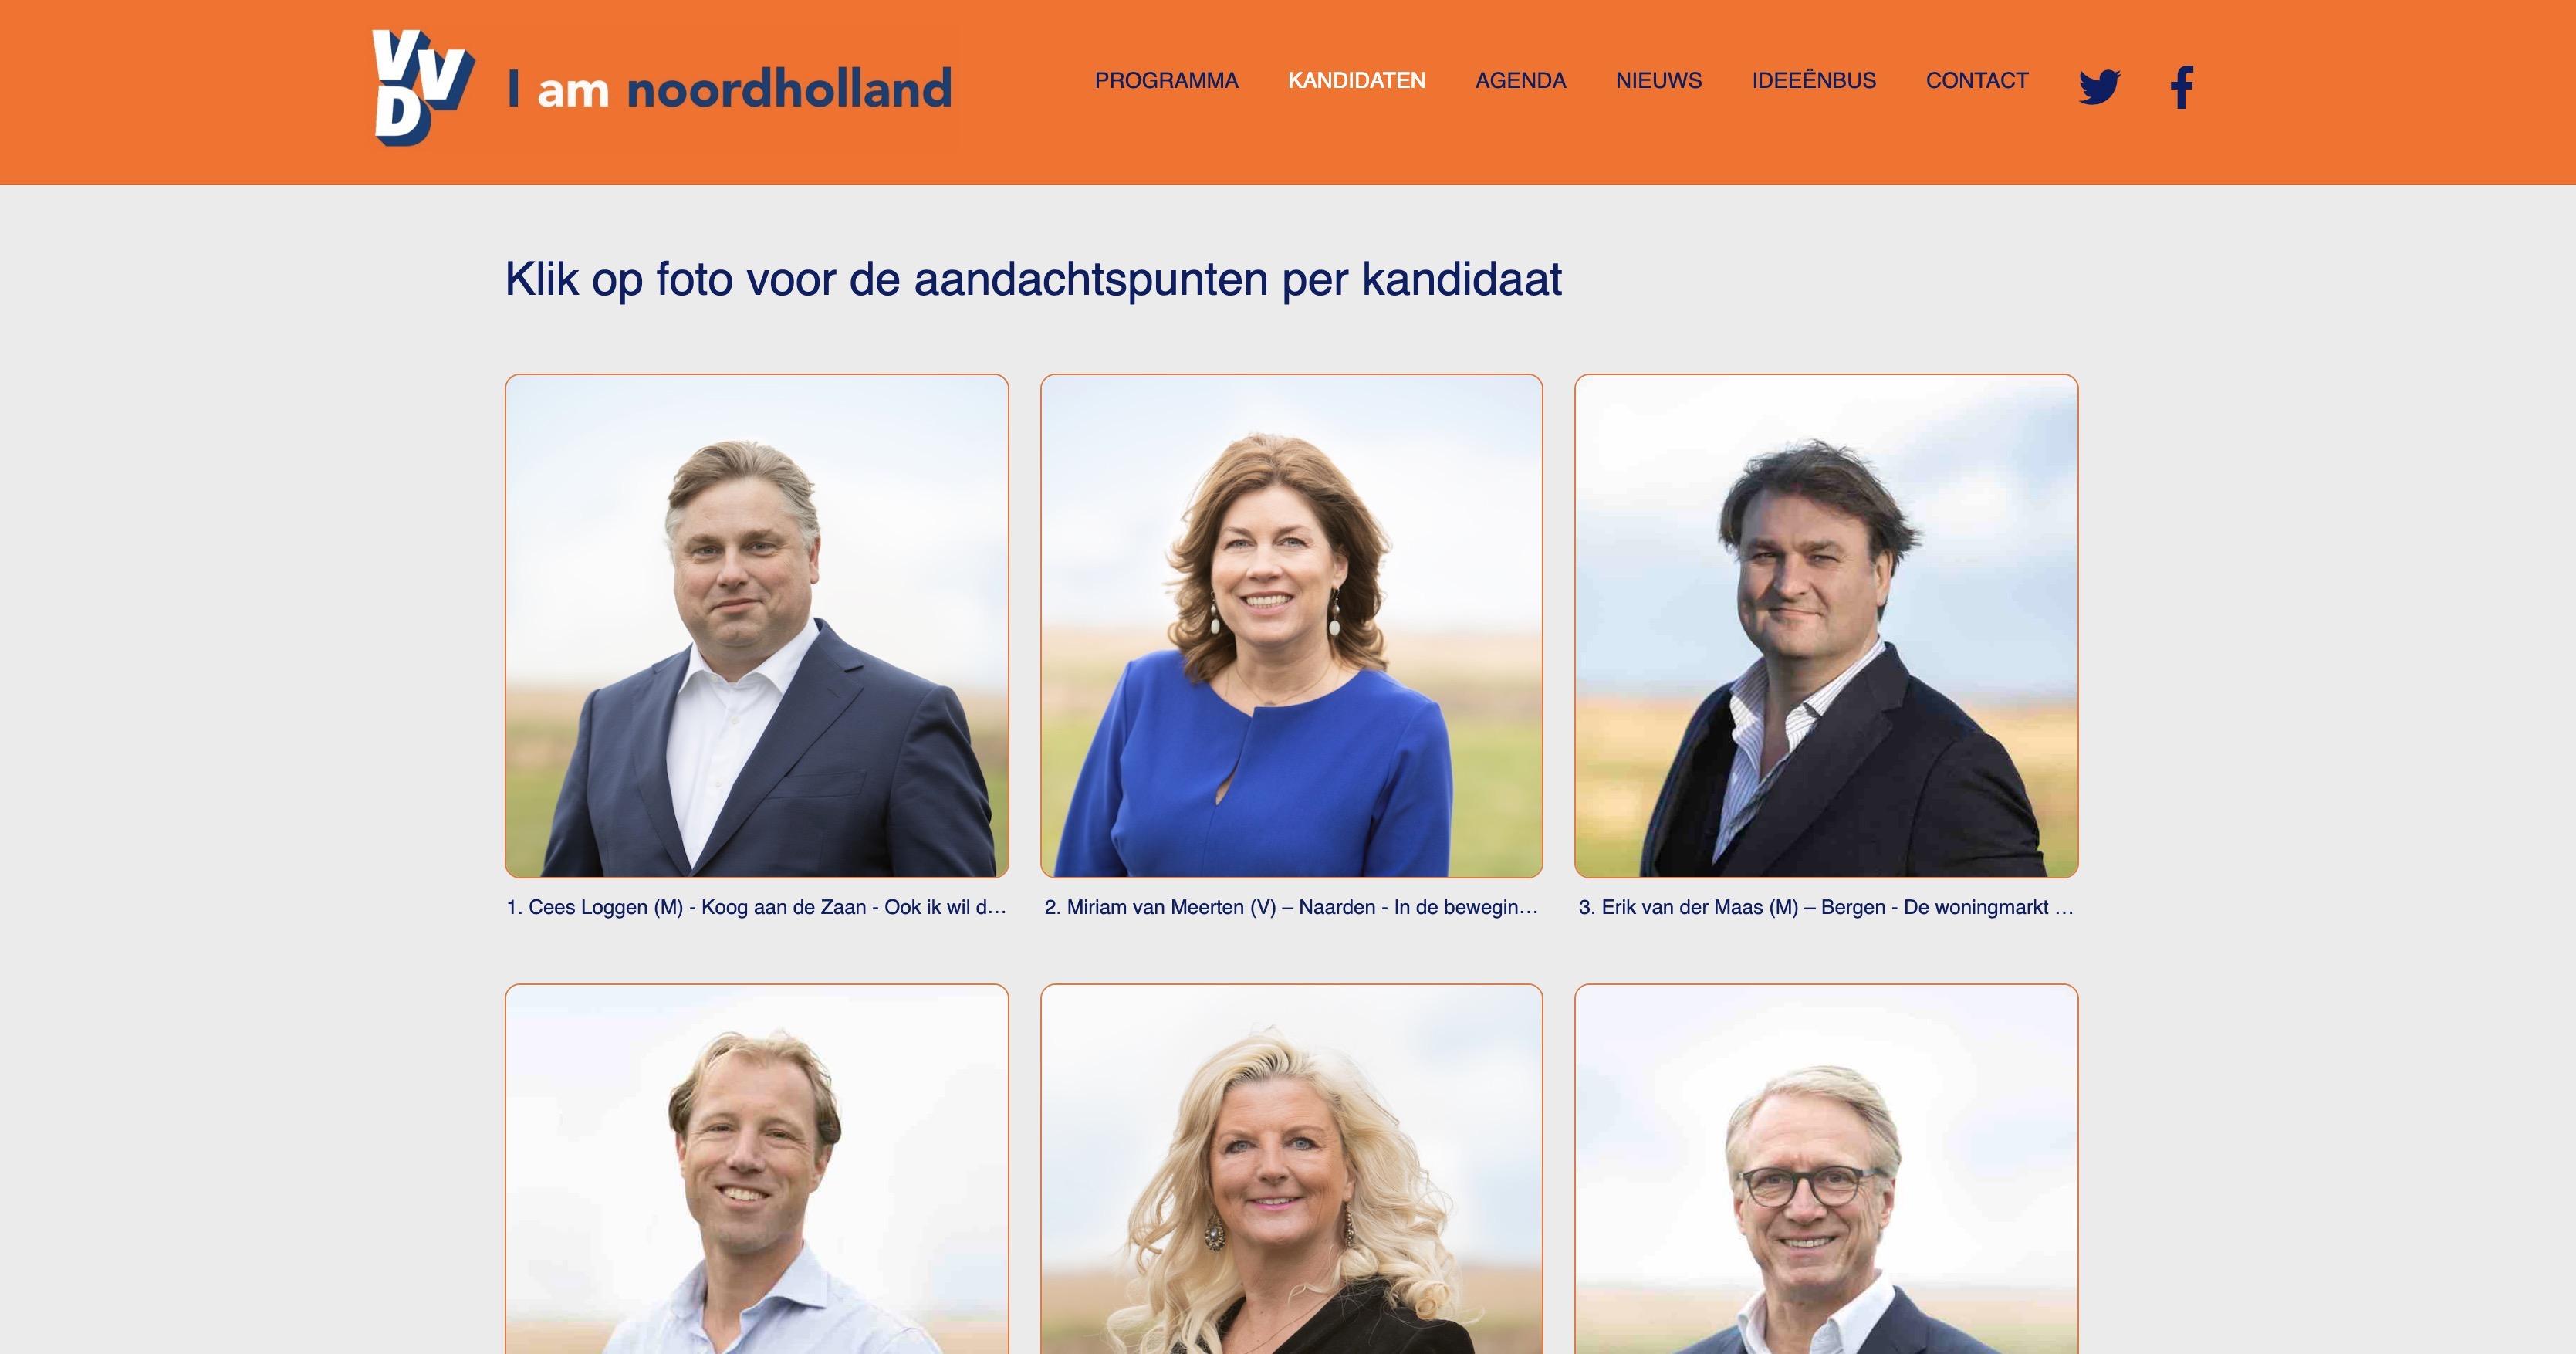 vvd-kandidaten-pagina